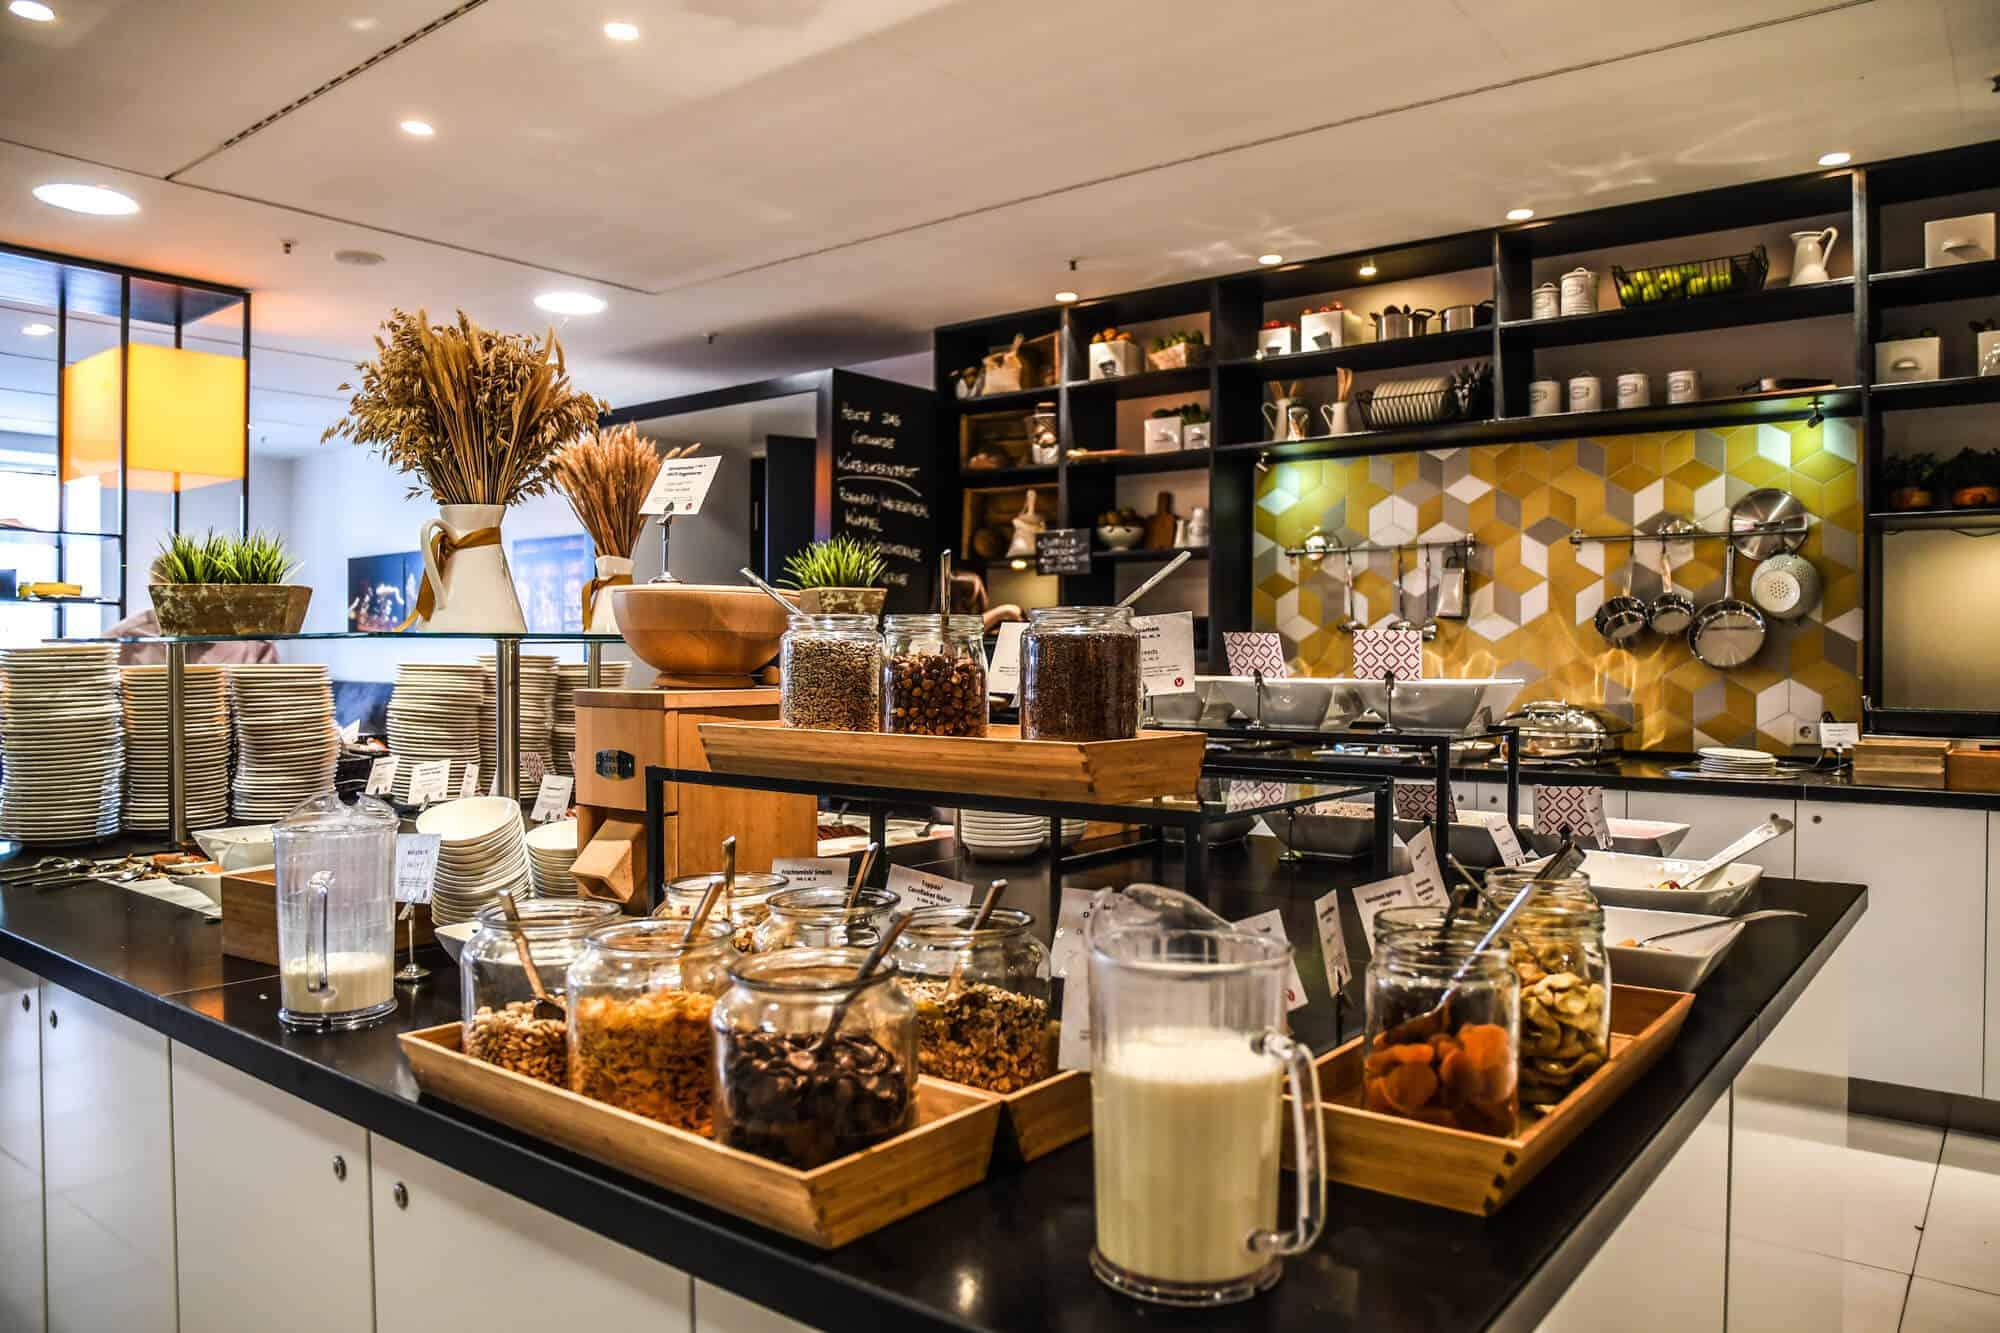 Vienna House Andel's Berlin – Restaurant Delight